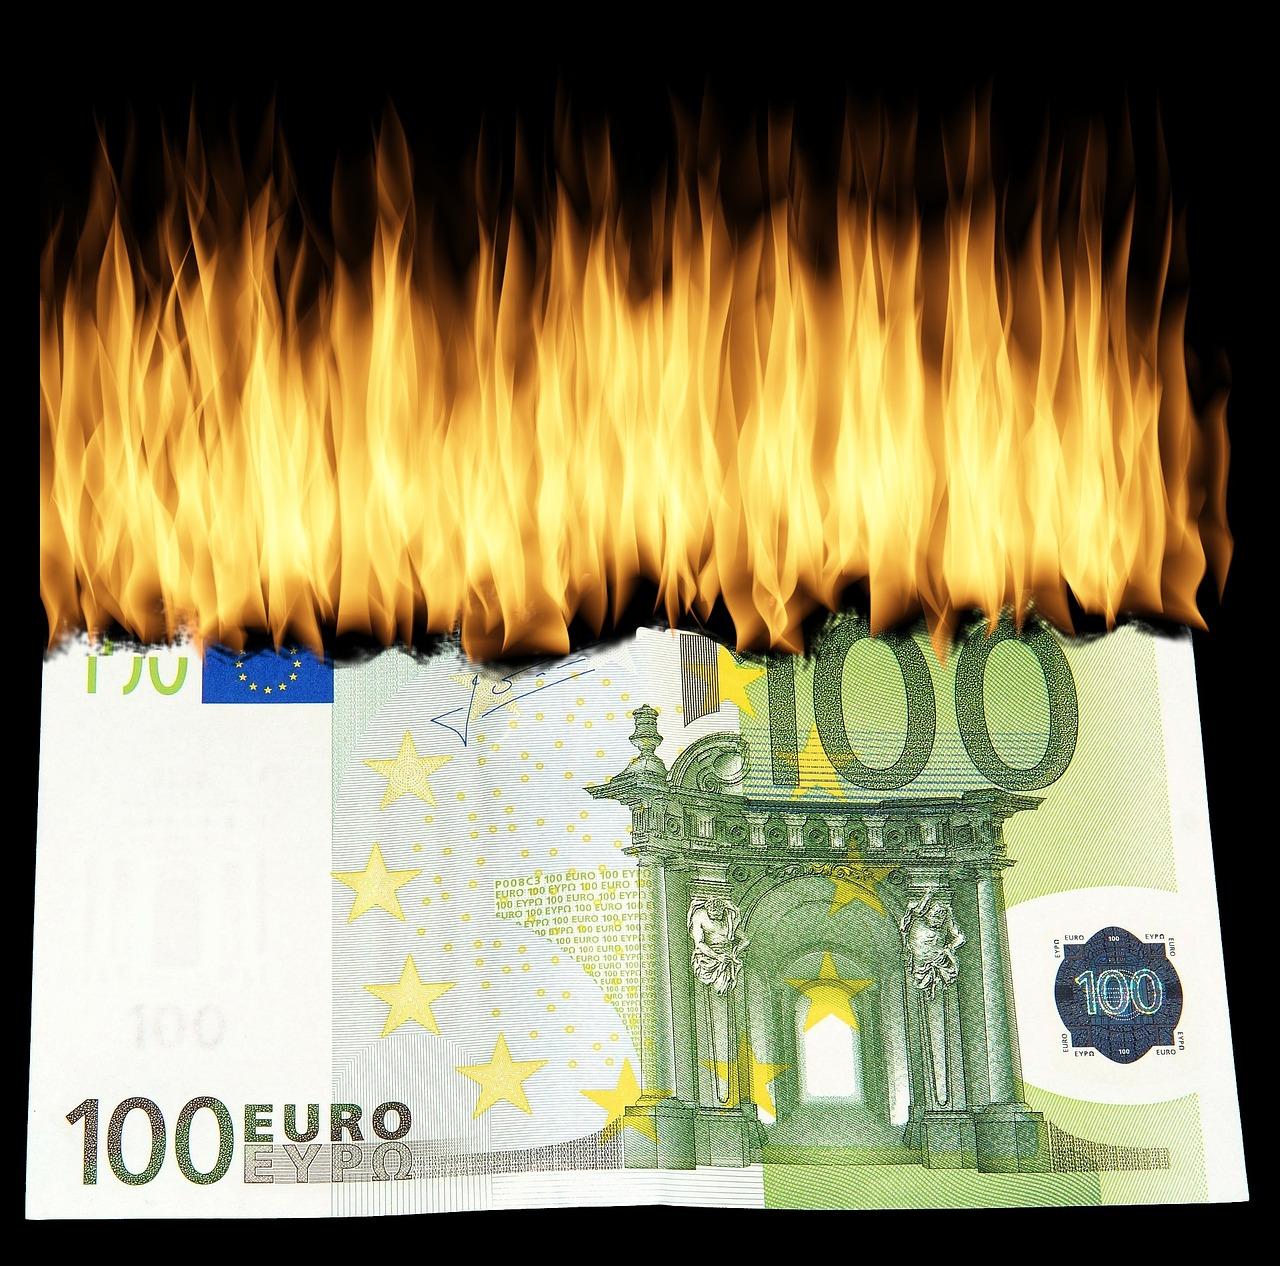 burn money